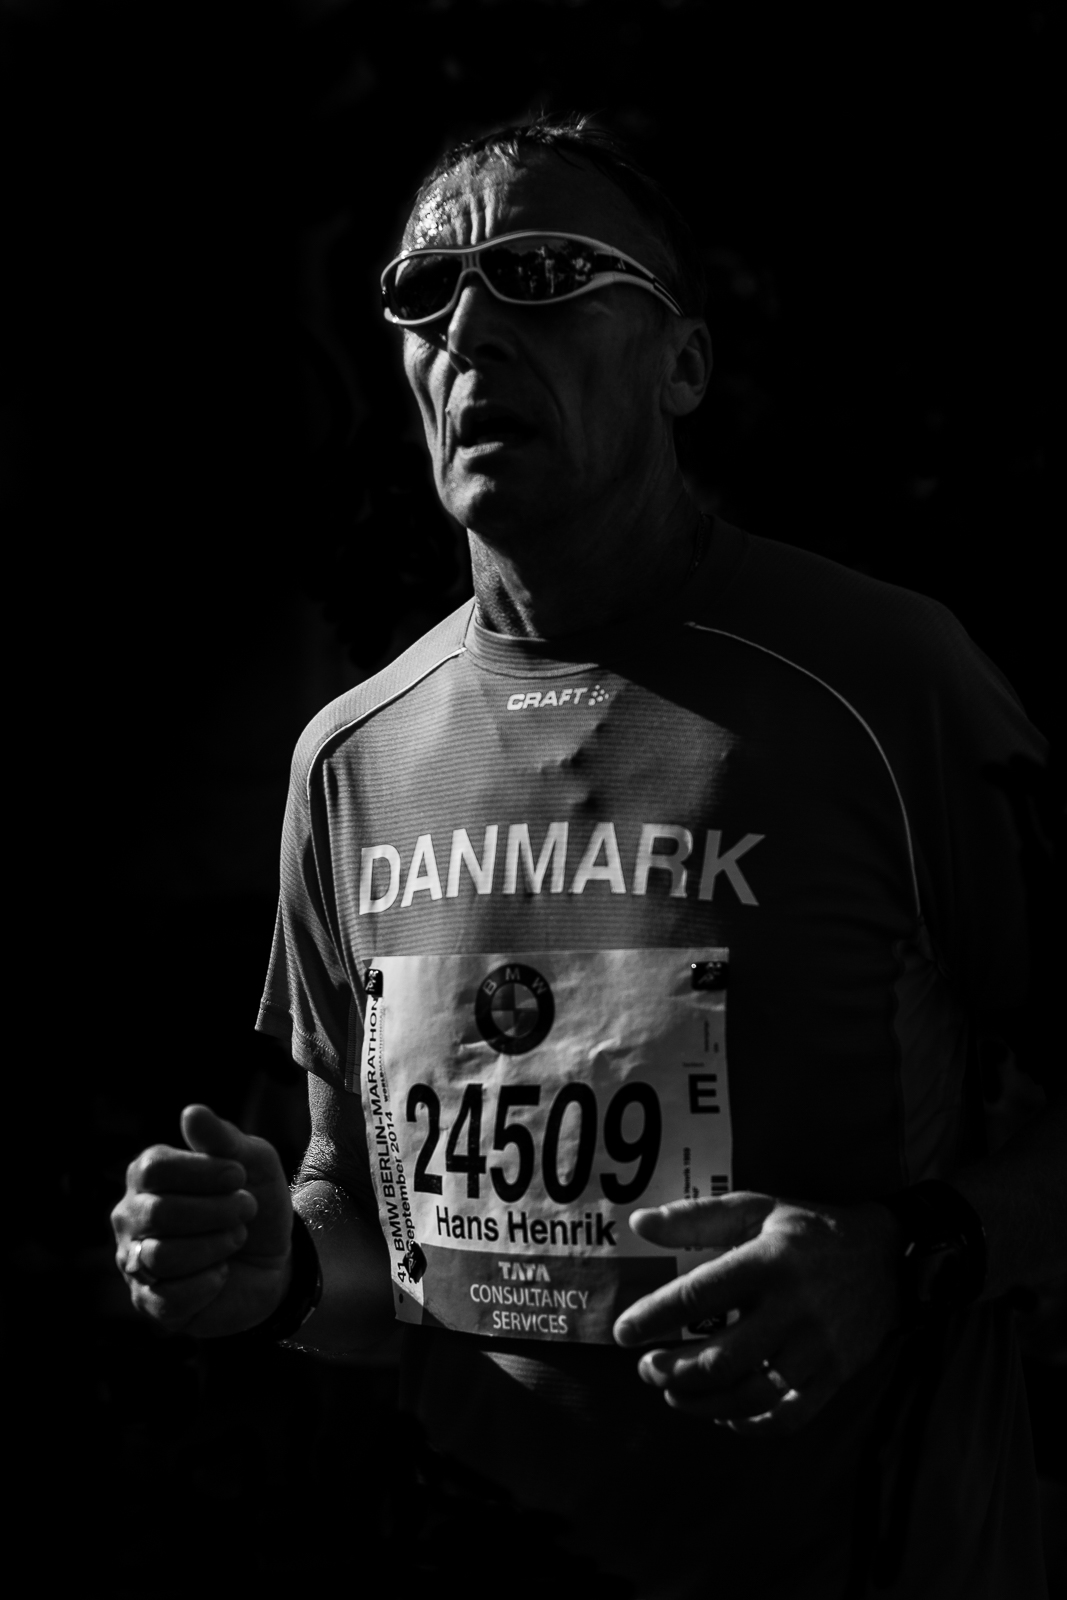 Sportfotgrafie Nürnberg Läufer BMW Berlin Marathon